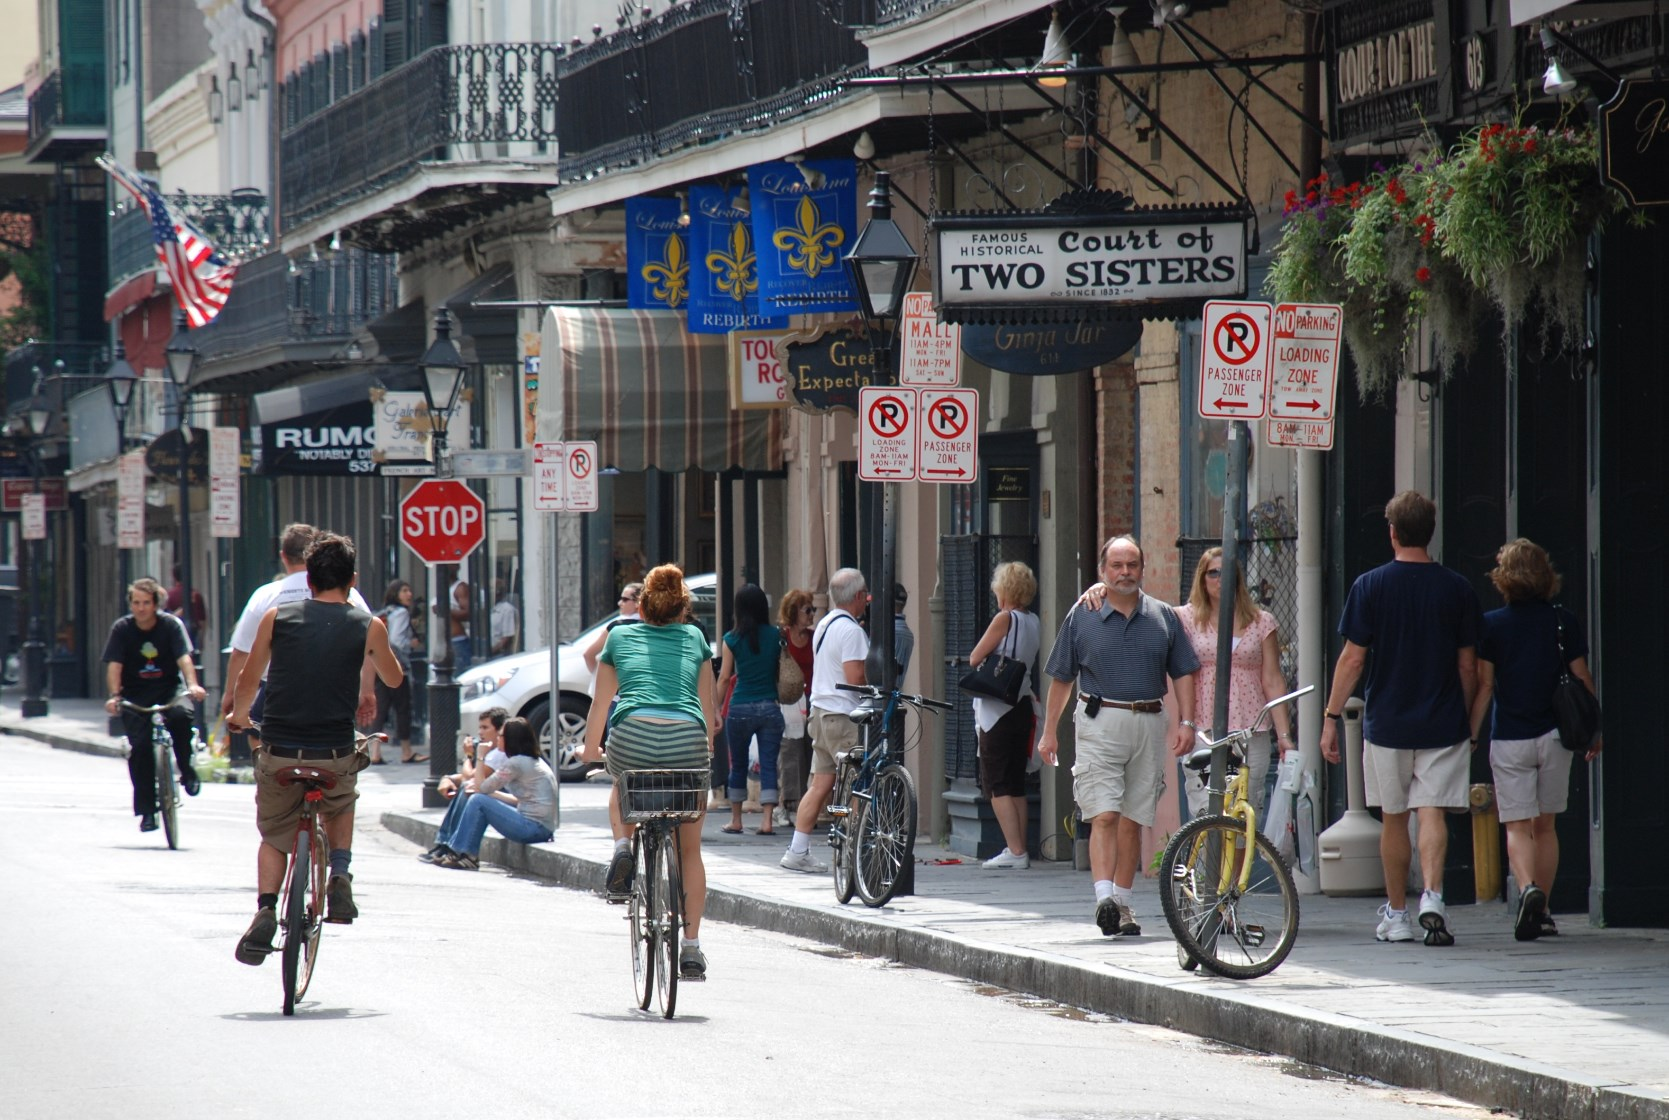 Biking on Bourbon Street. Photo: Dan Jatres